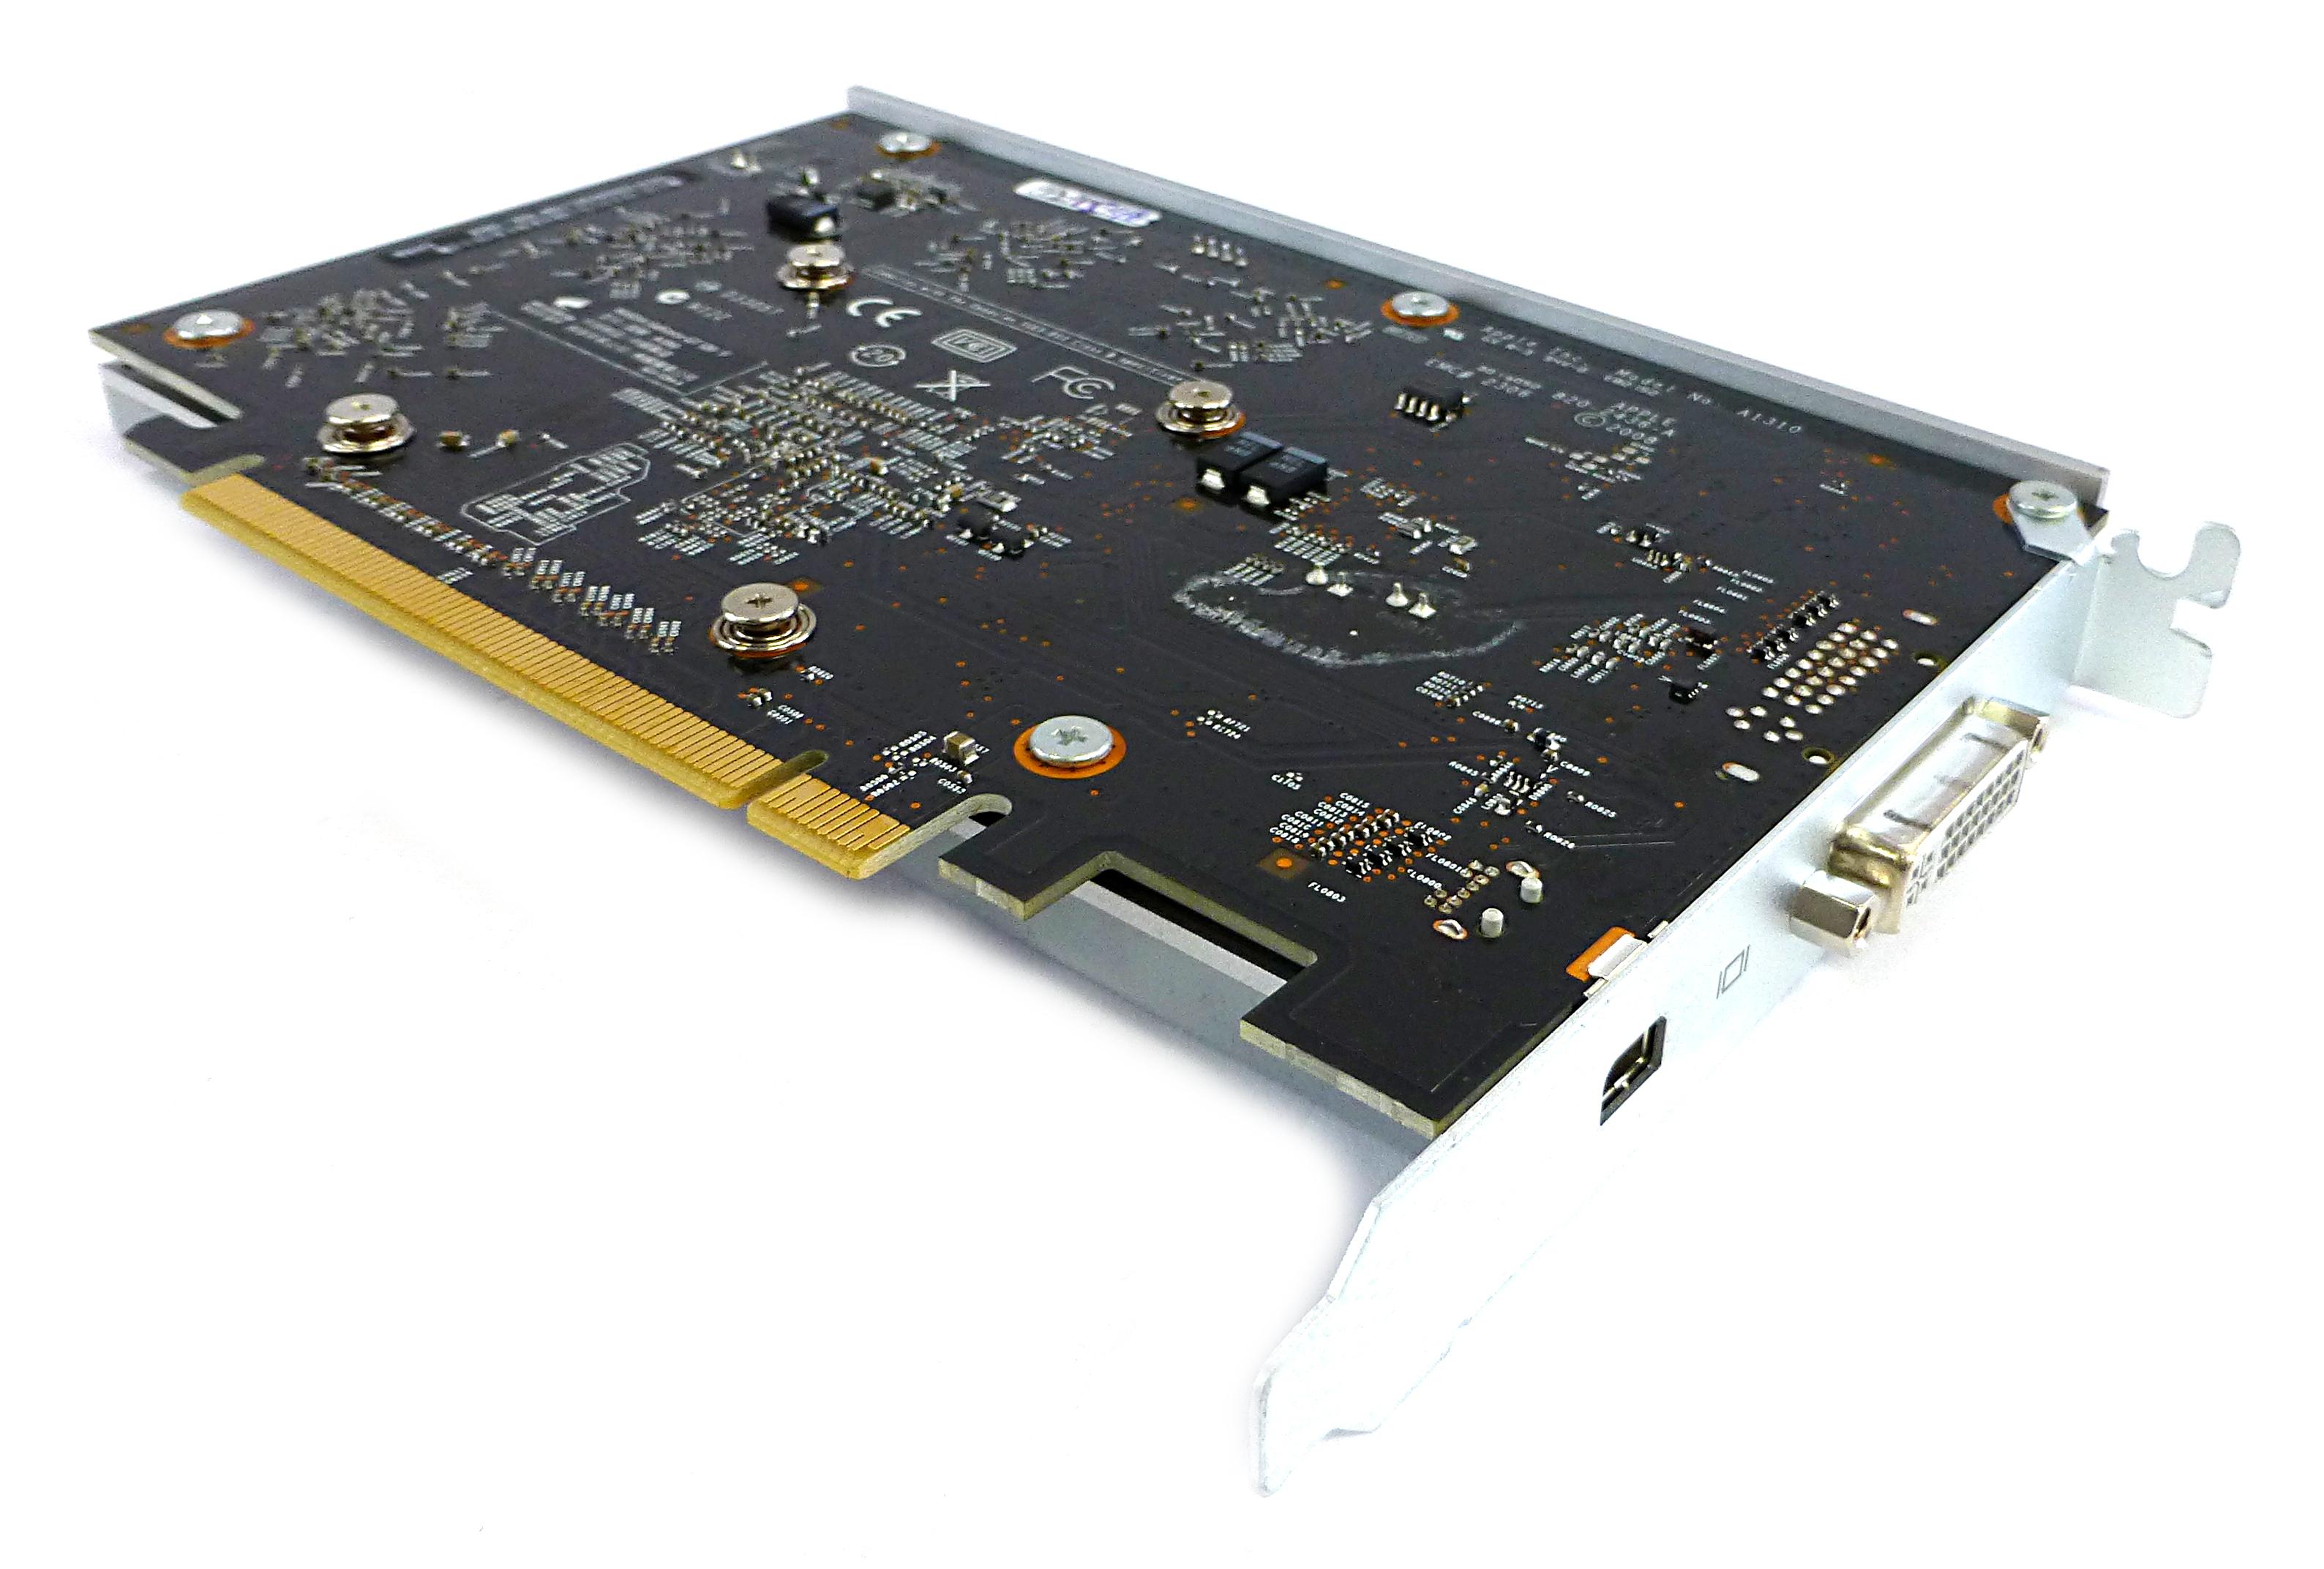 6390950 apple mac pro nvidia geforce gt120 512mb graphics